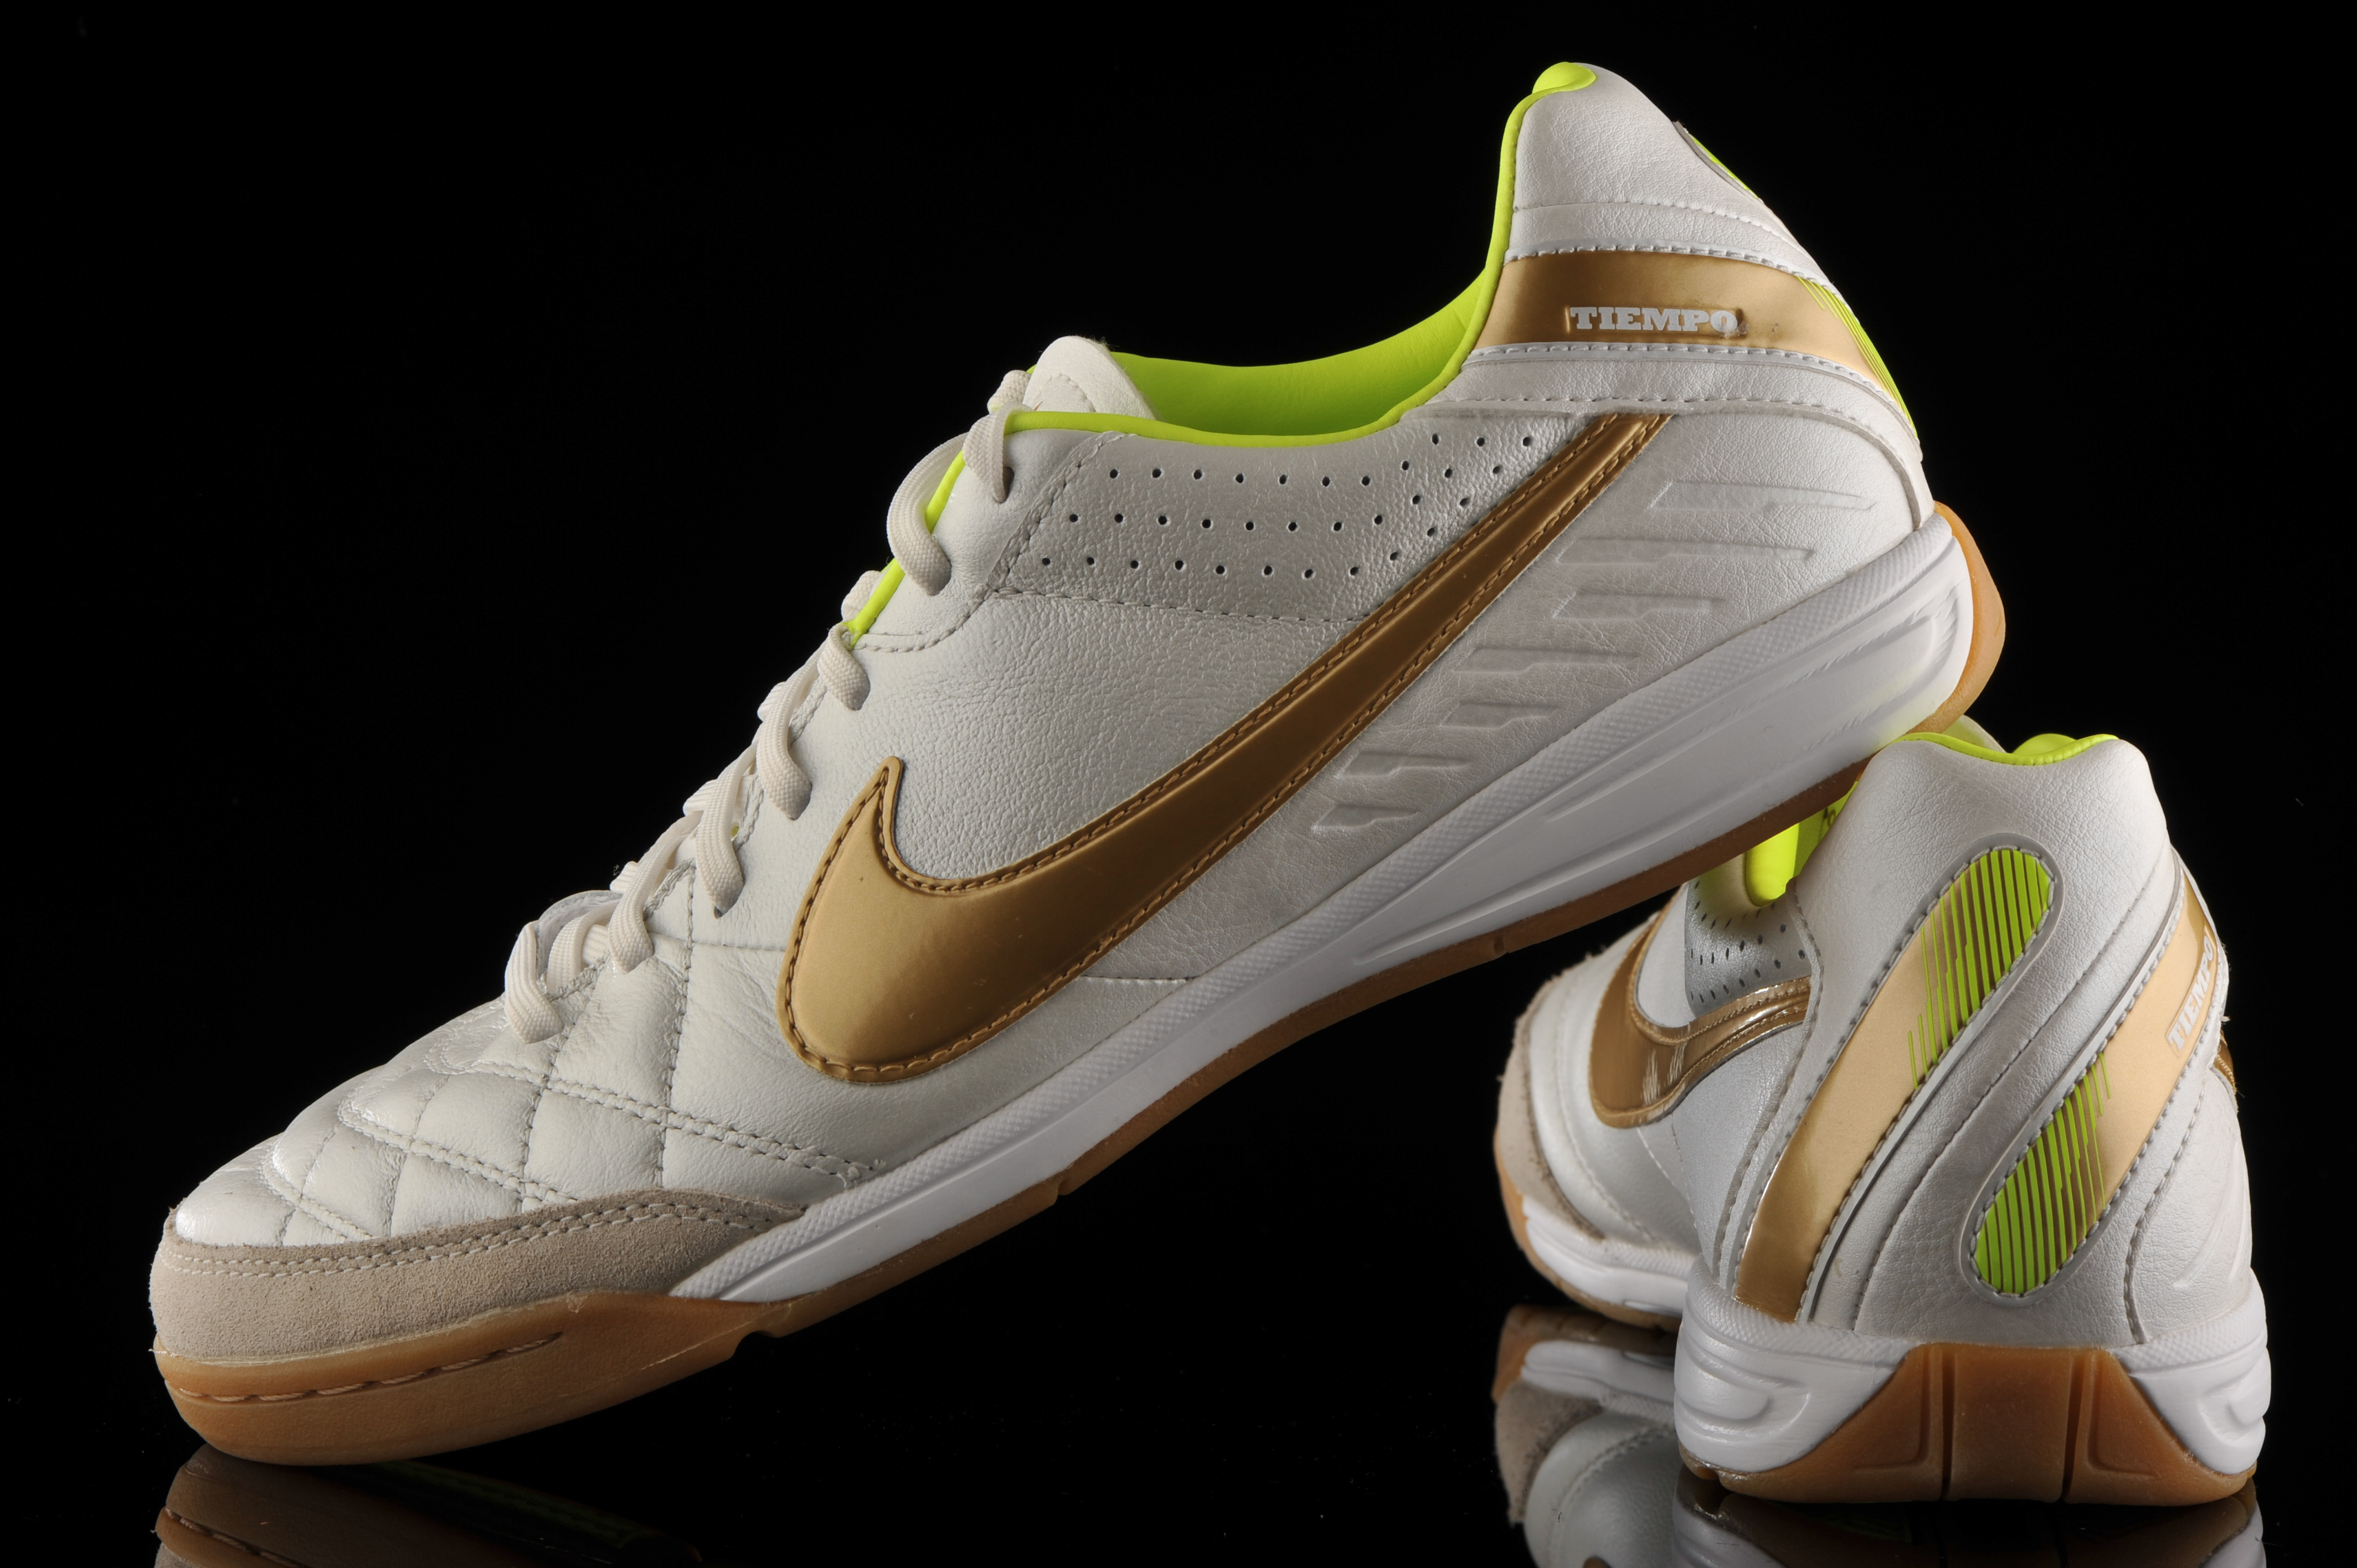 Masaje Qué Centrar  Nike Tiempo Mystic IV IC 454333-177 | R-GOL.com - Football boots & equipment